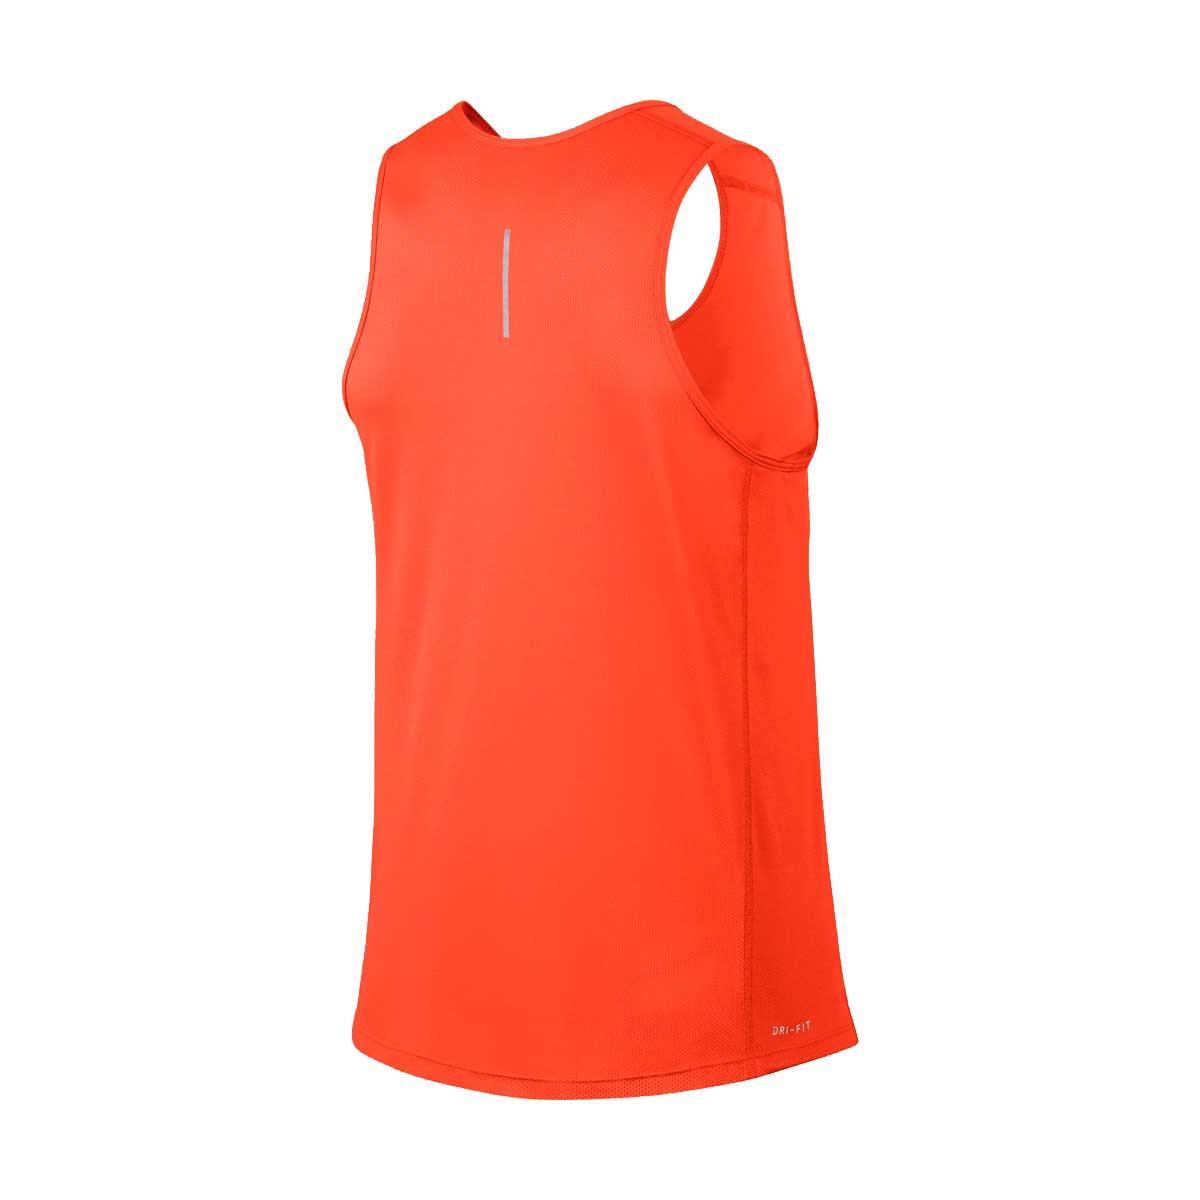 1b08feedc9318 Camiseta Regata Nike Dry Miler Masculino